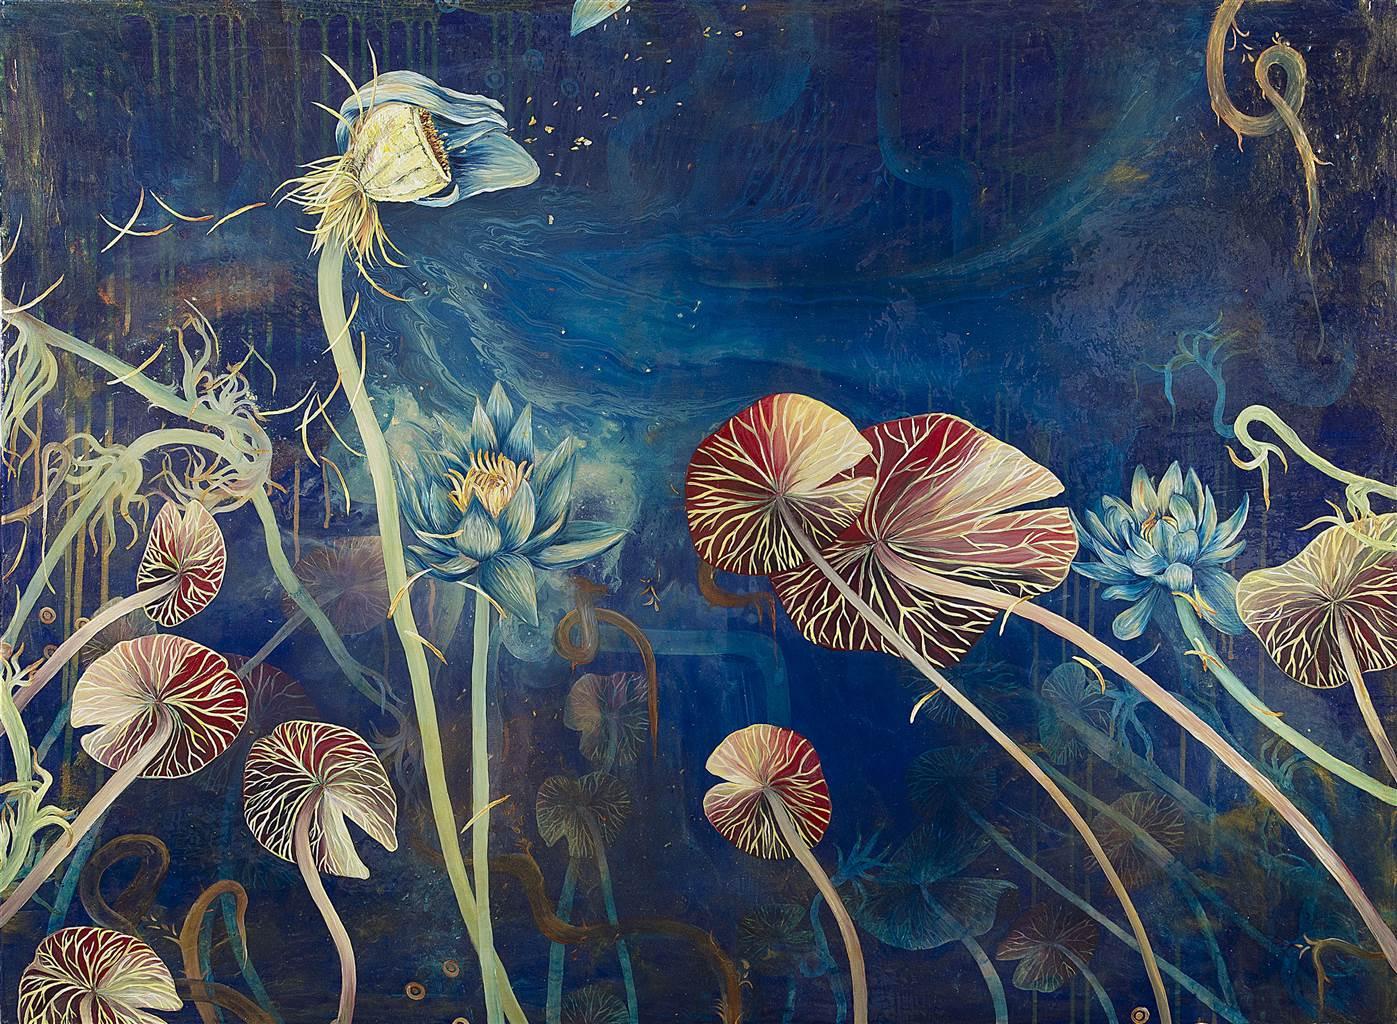 Vicky Talwar - Artist's Profile - Agora Gallery